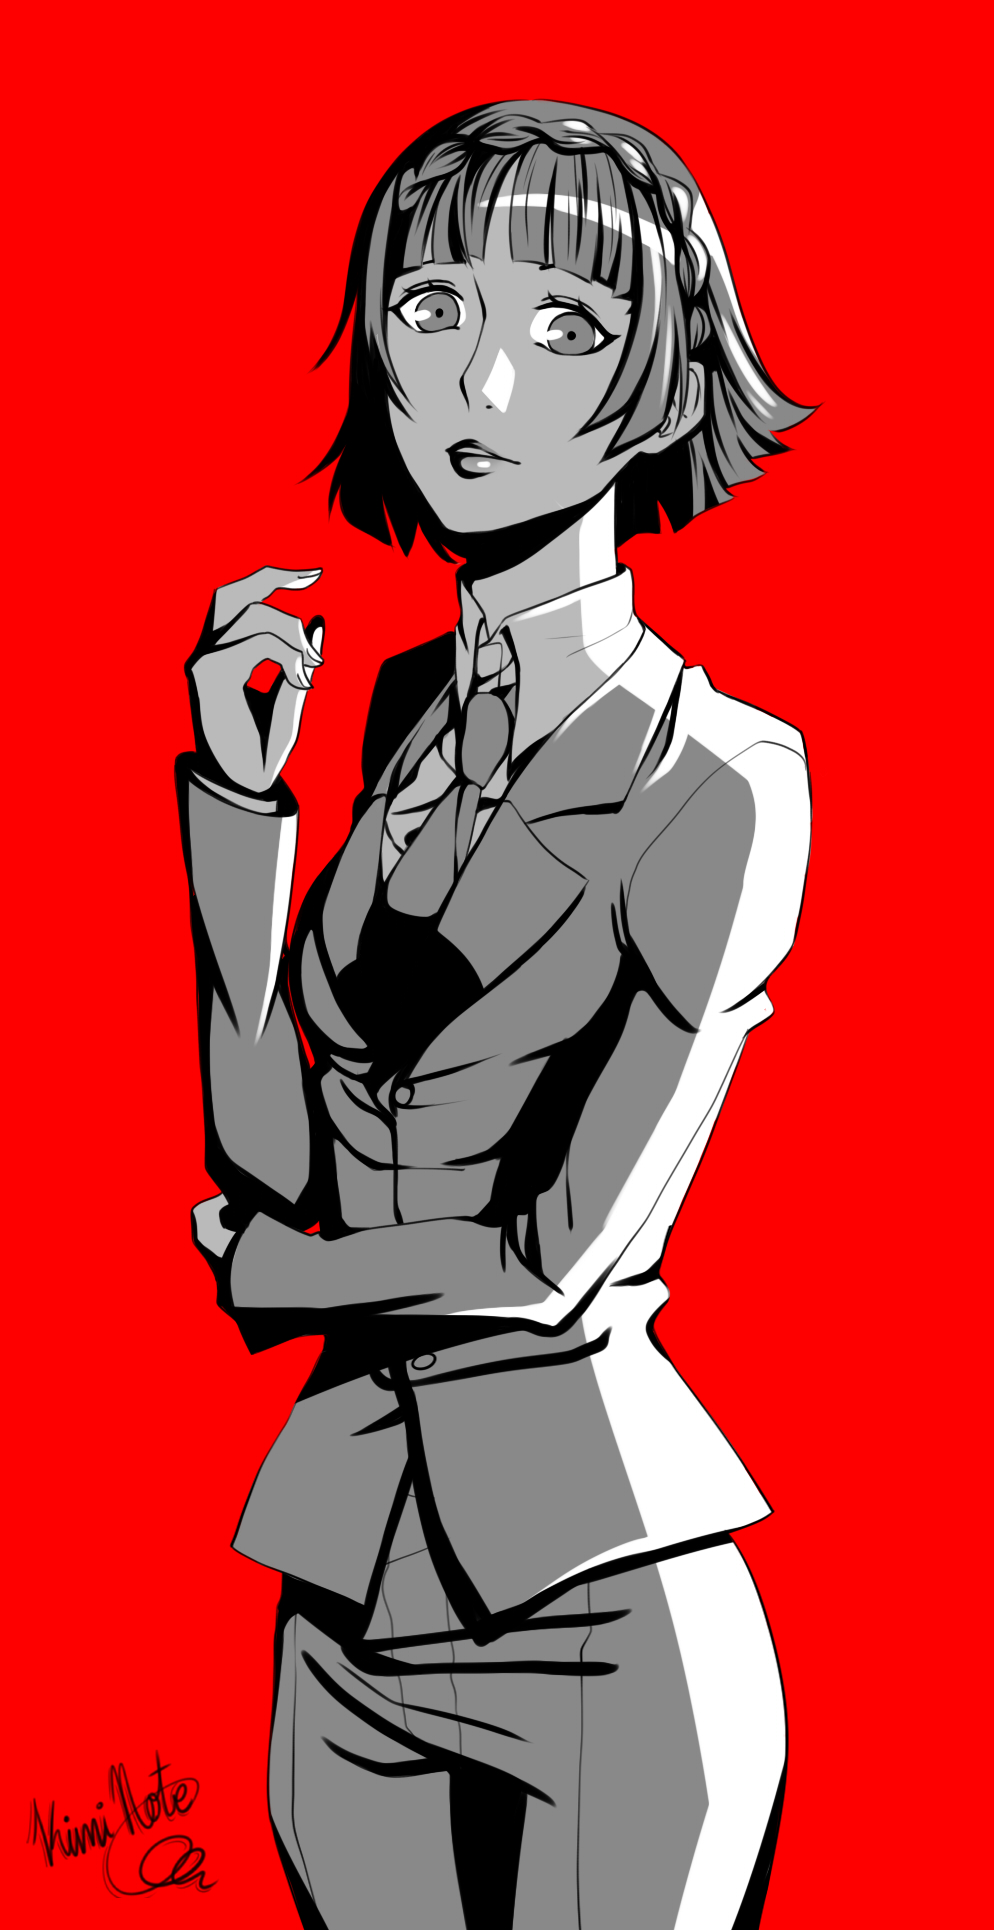 Persona 5 - Makoto Niijima (Suit) by Kimi-Note on DeviantArt